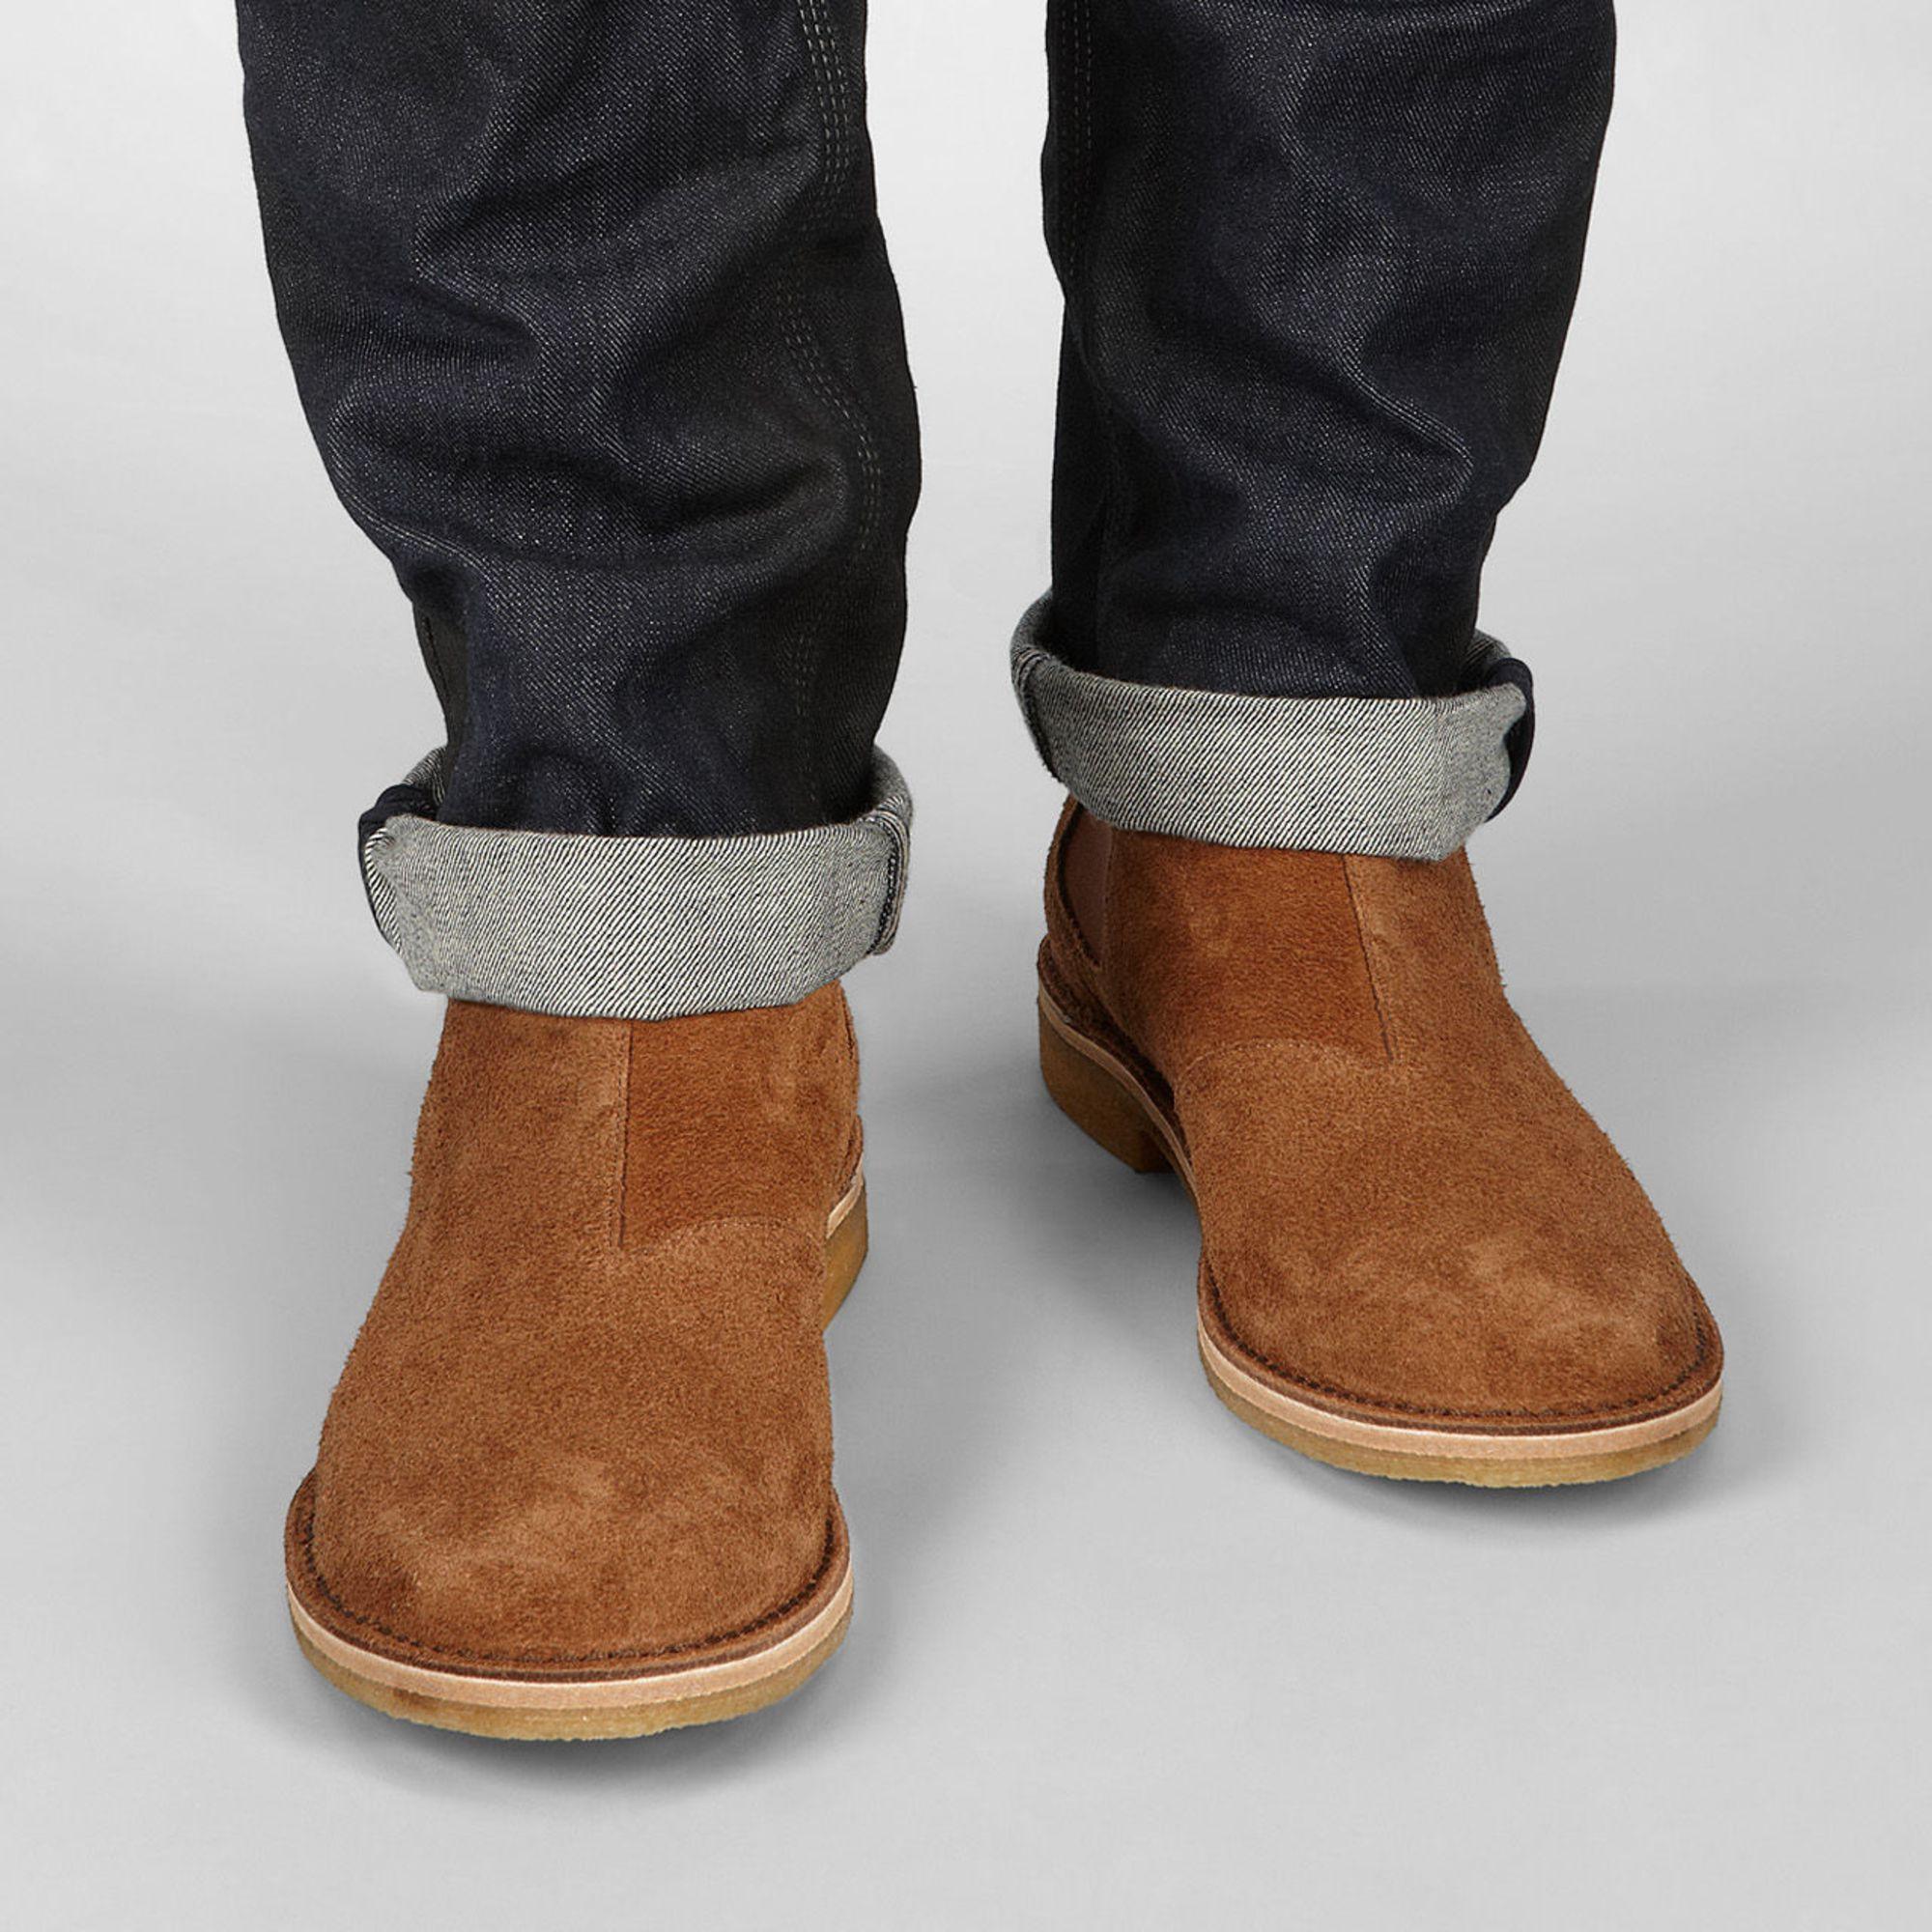 bottega veneta buffalo suede chelsea boots in brown for men junior lyst. Black Bedroom Furniture Sets. Home Design Ideas